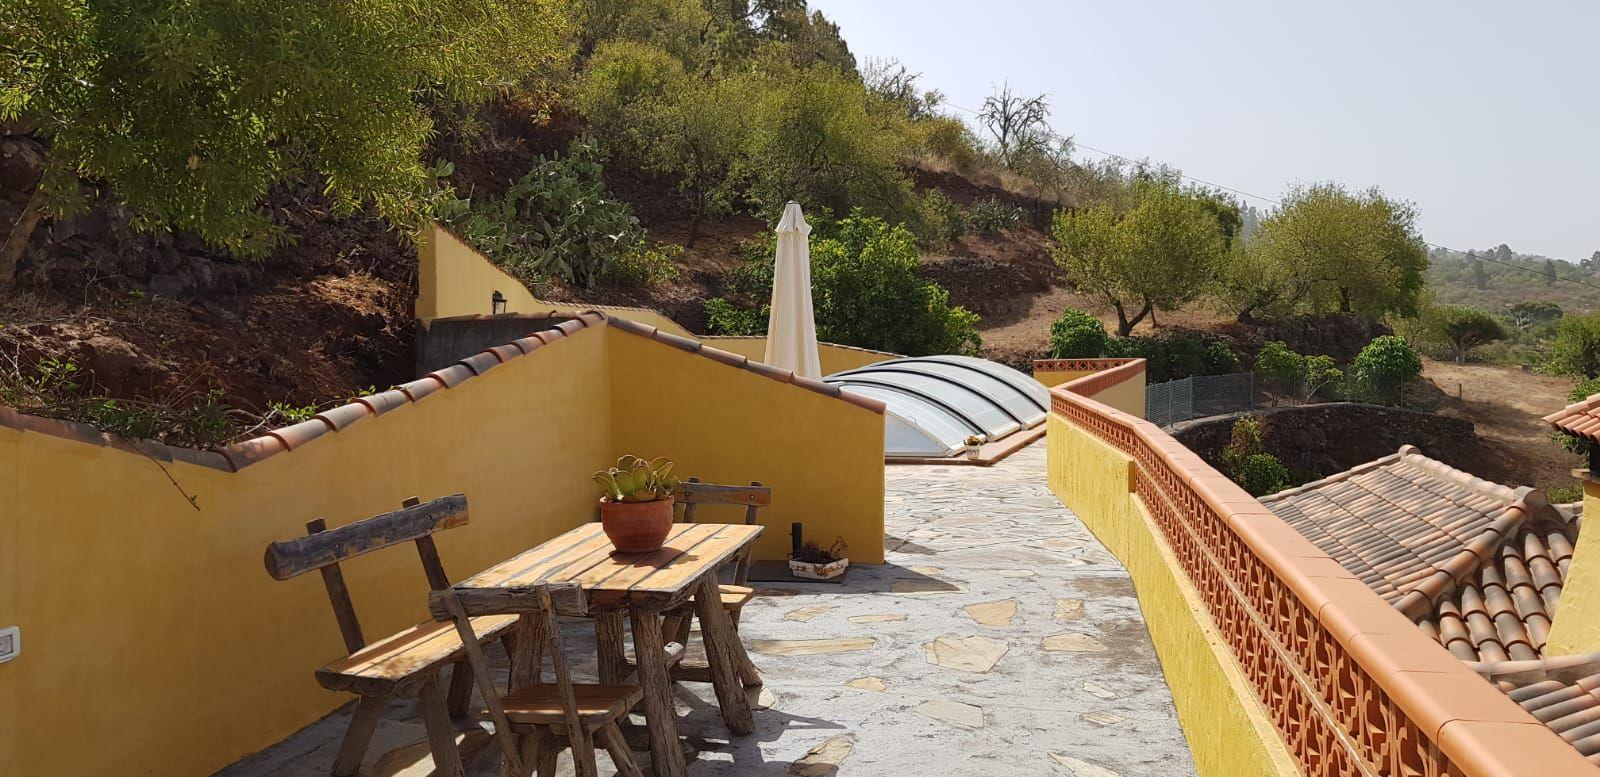 Patio area by the pool Villa Alicia